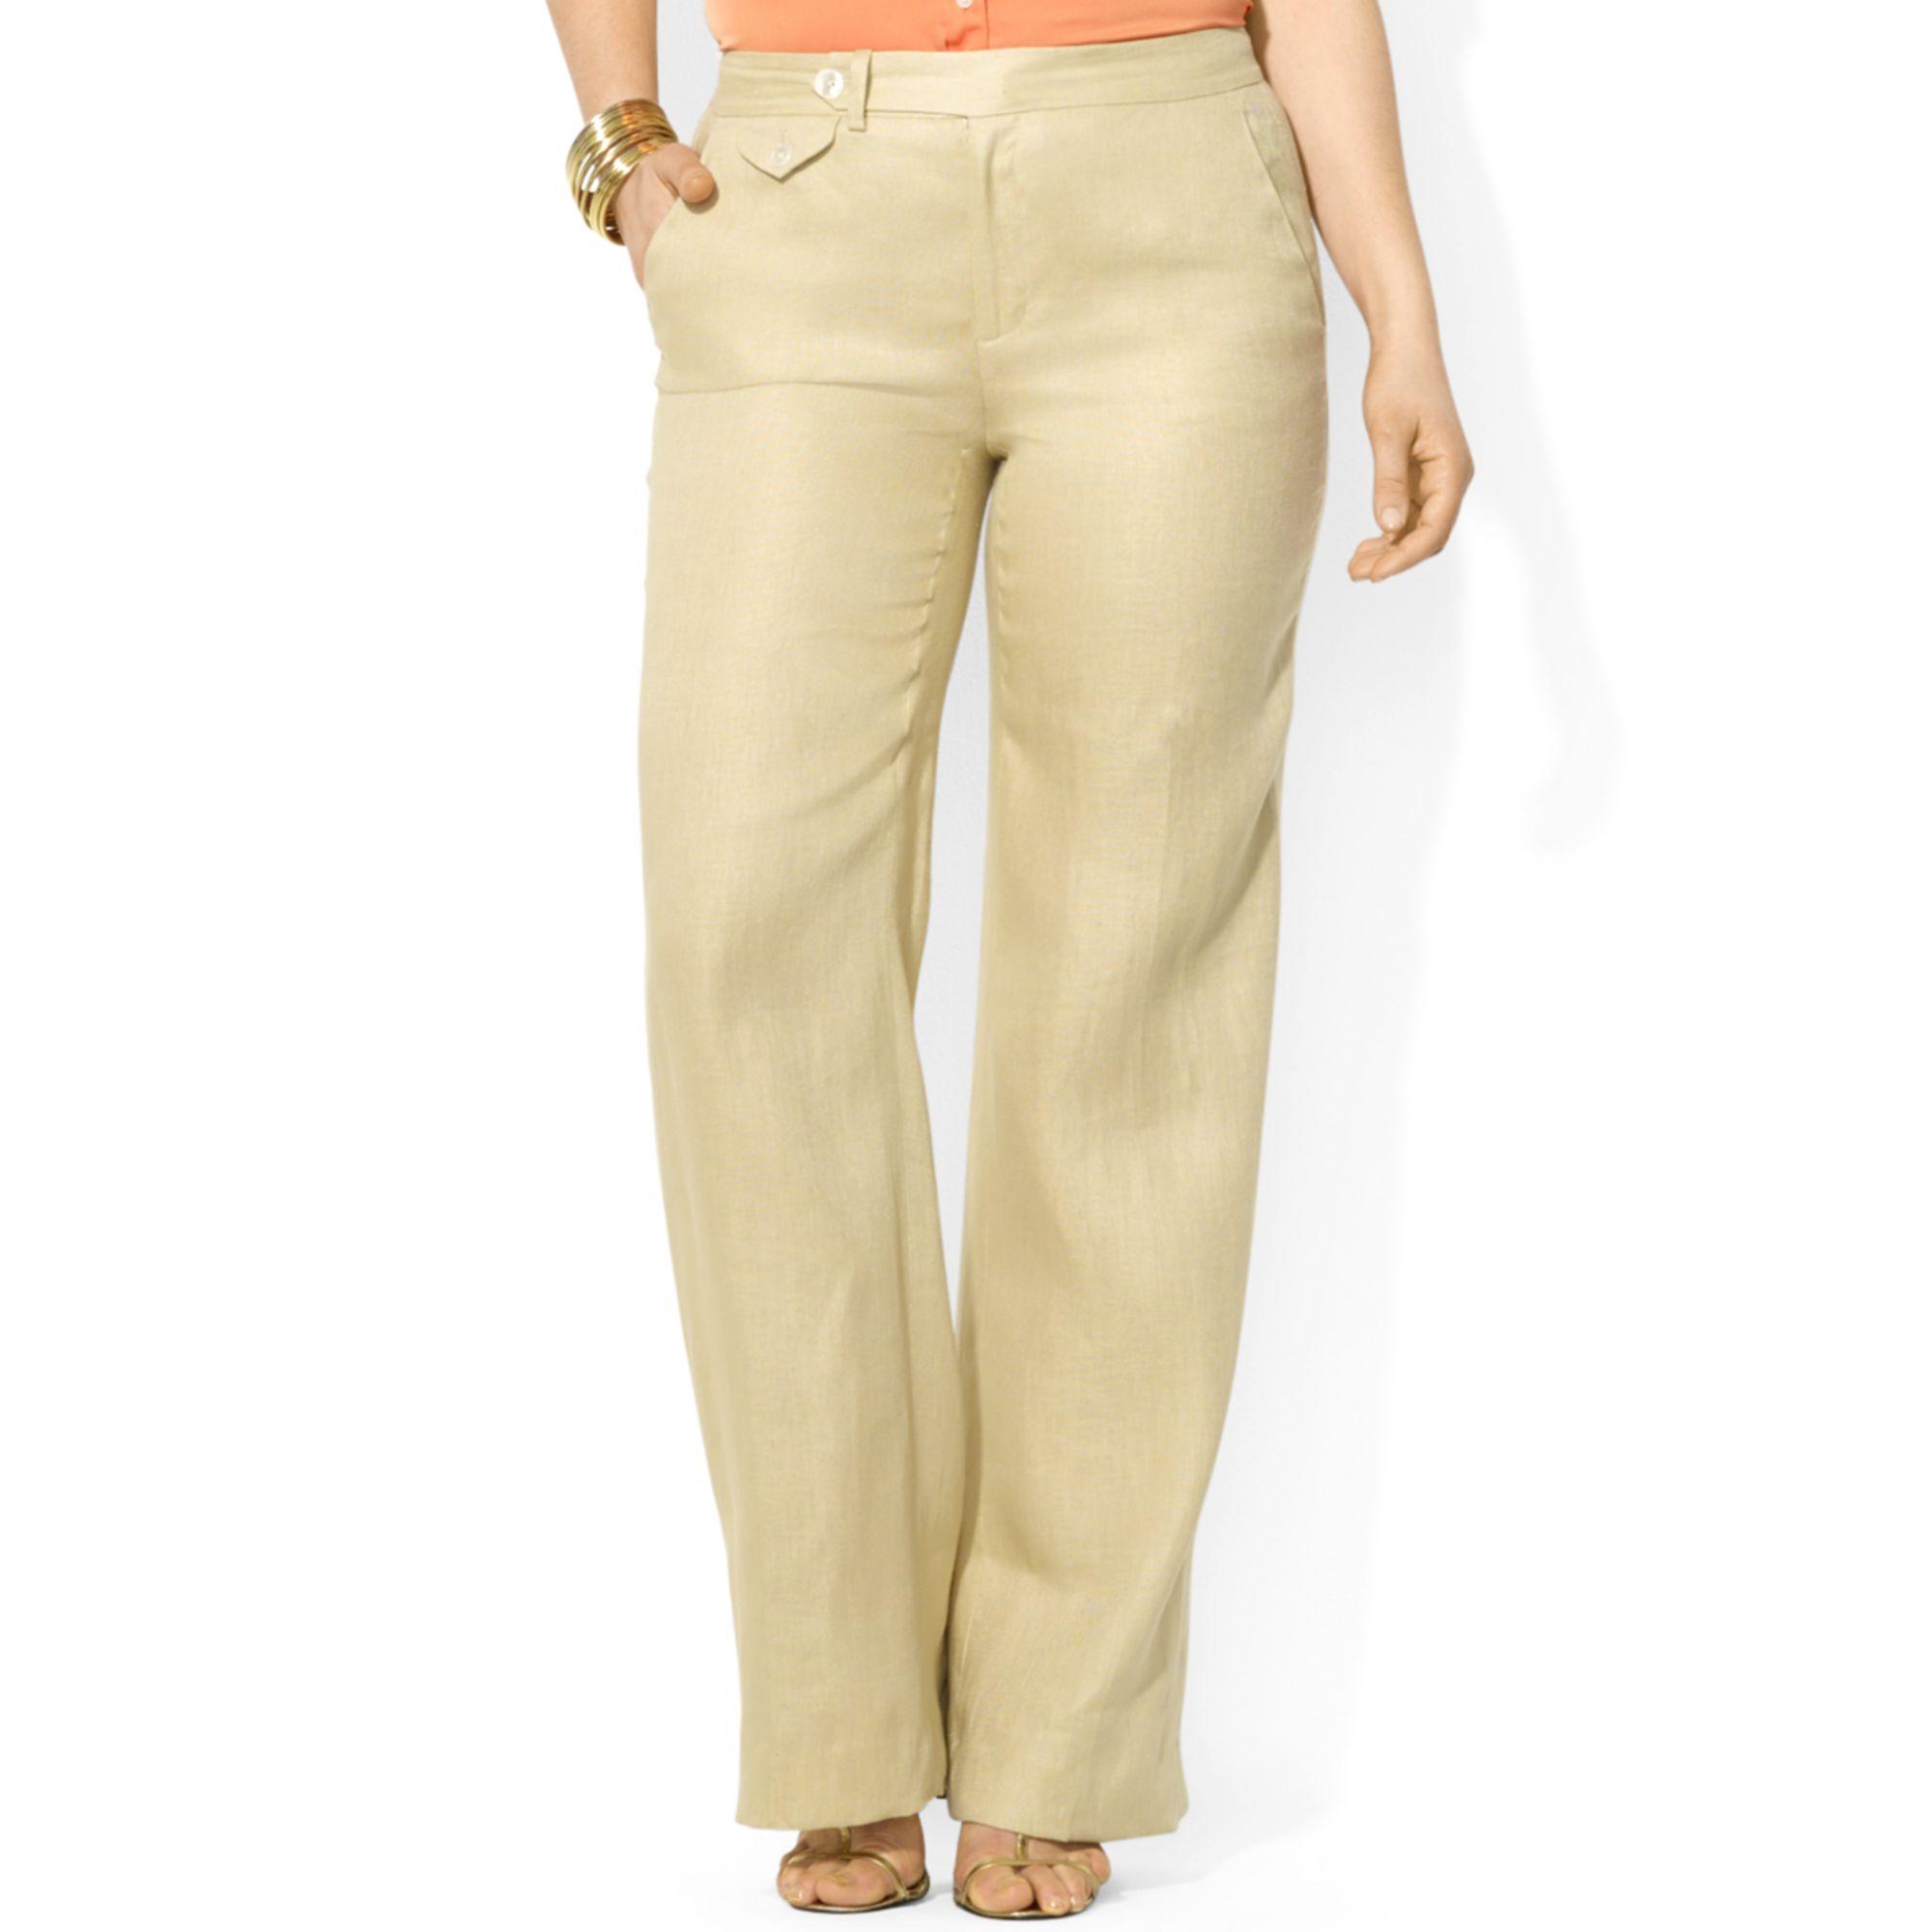 6d118f66cb4aa Lyst - Lauren by Ralph Lauren Plus Size Wideleg Linen Pants in Natural